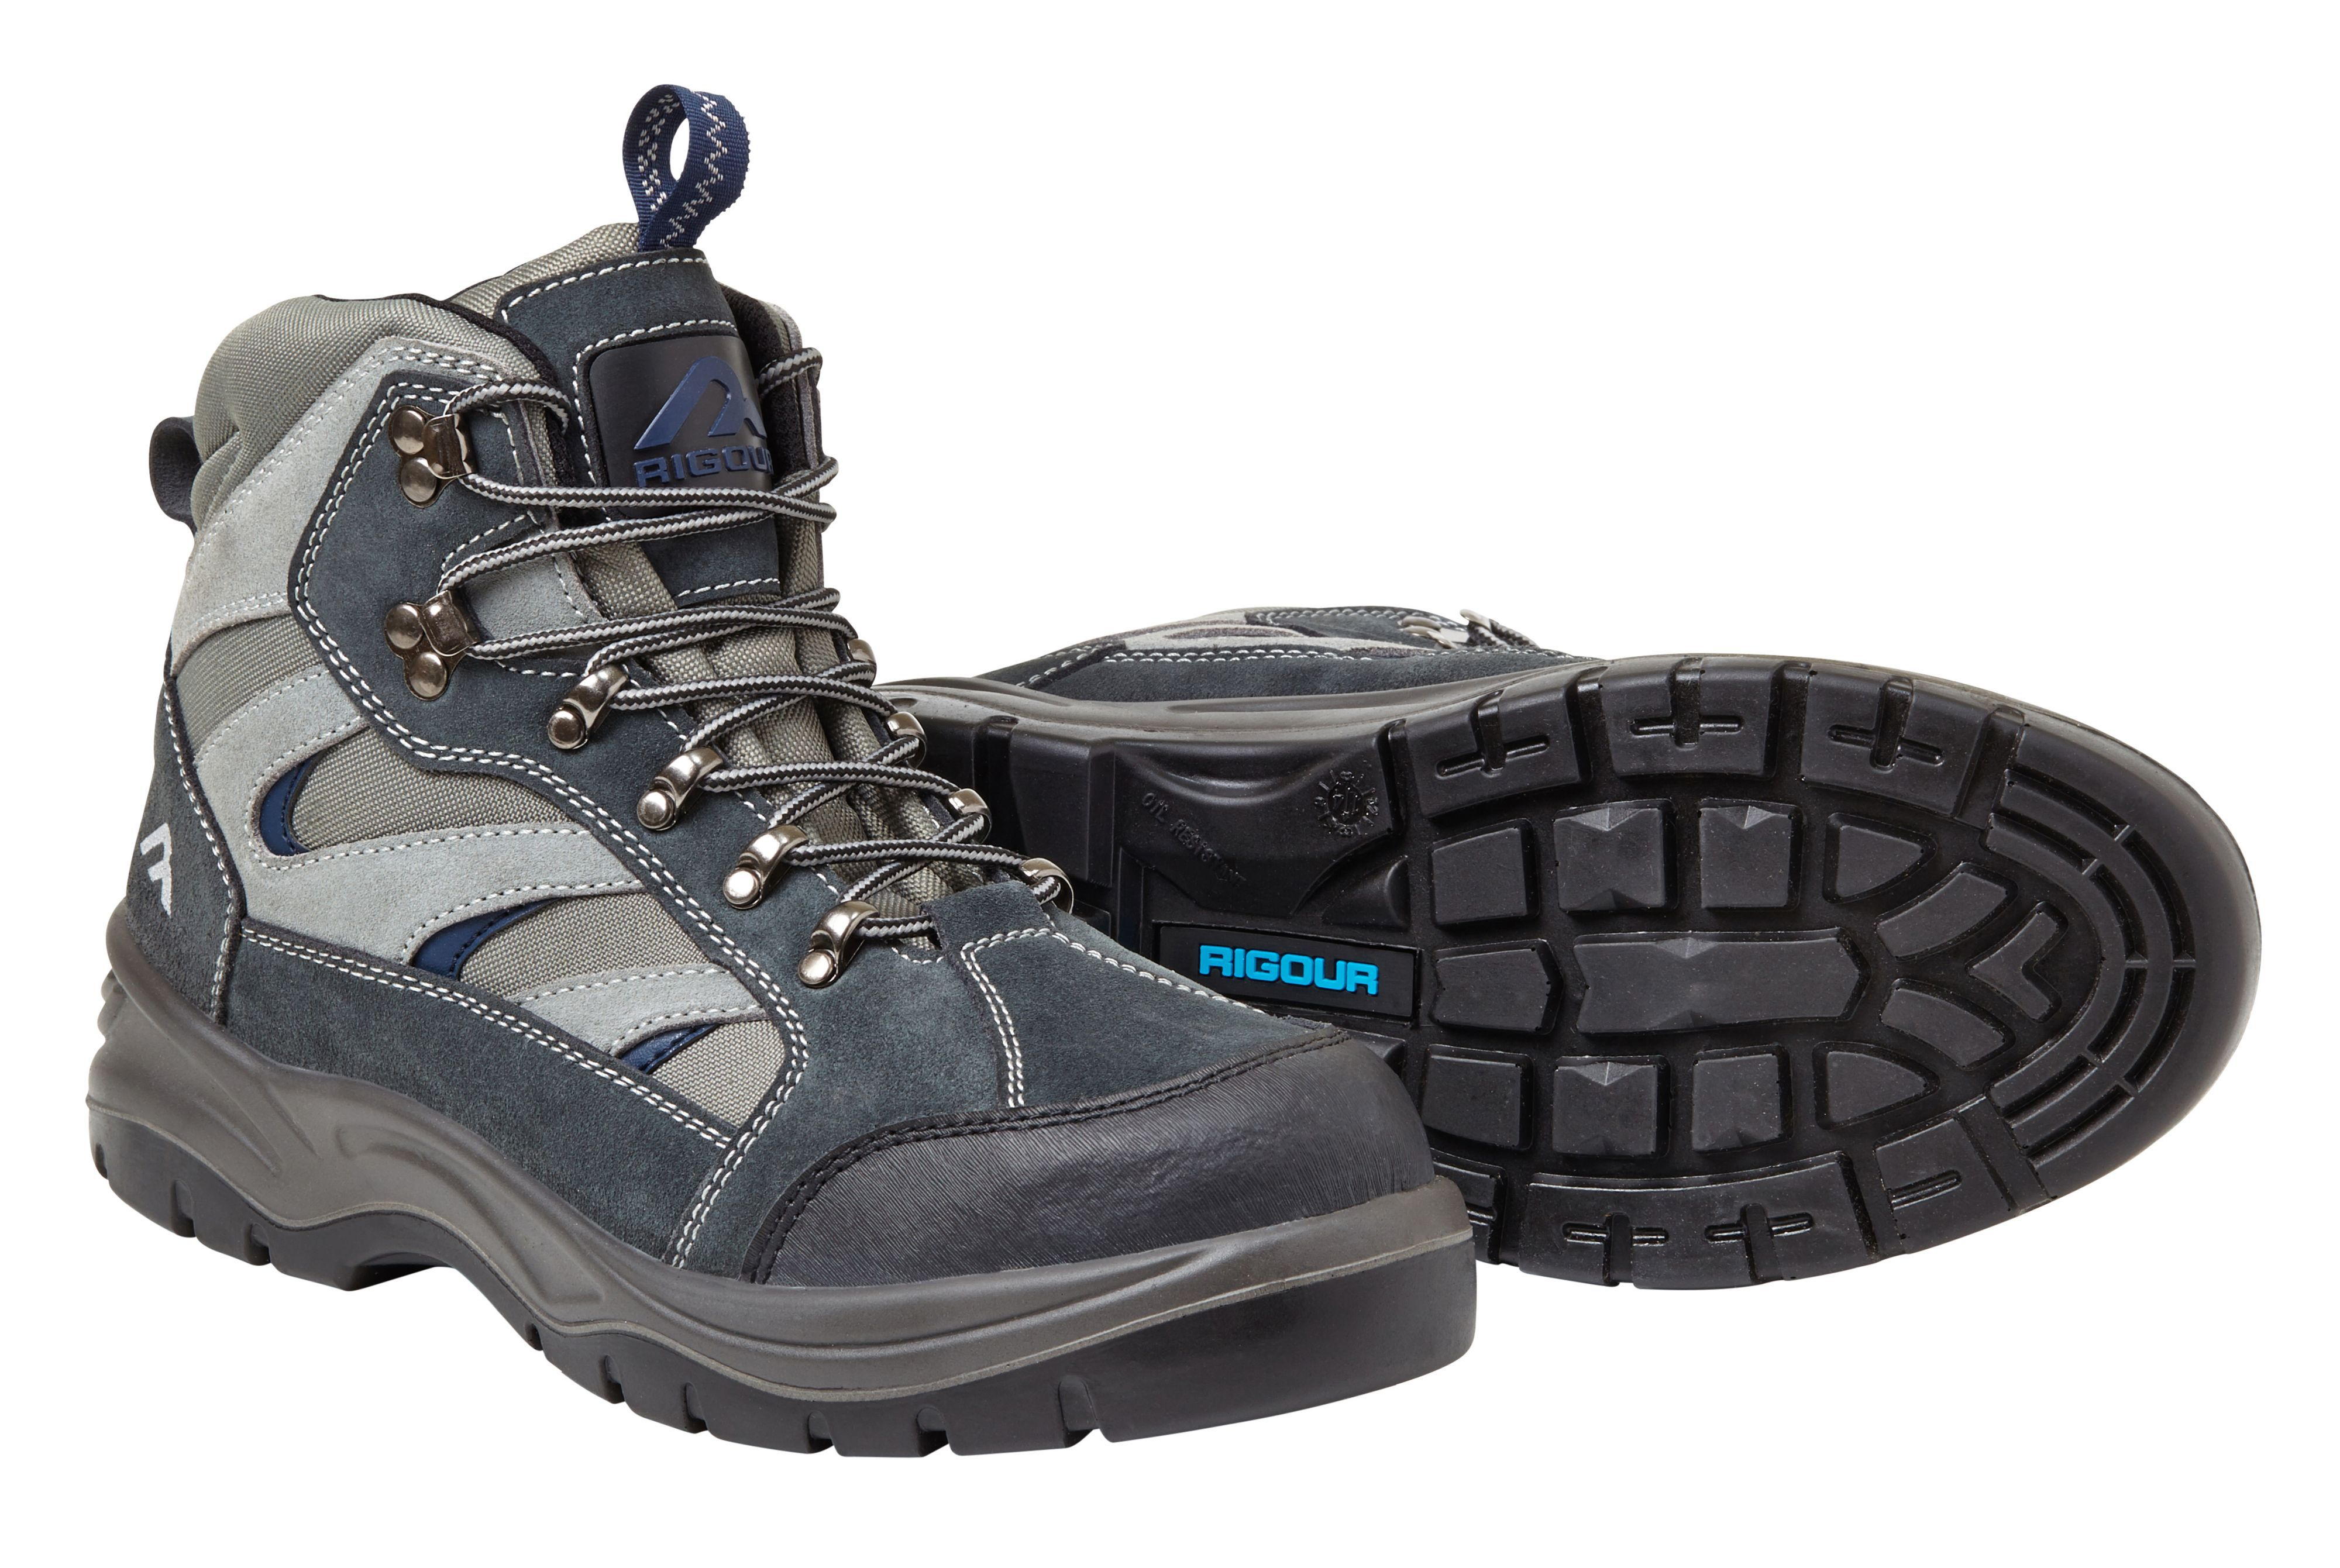 Rigour Grey & Blue Hiker Boots, Size 10